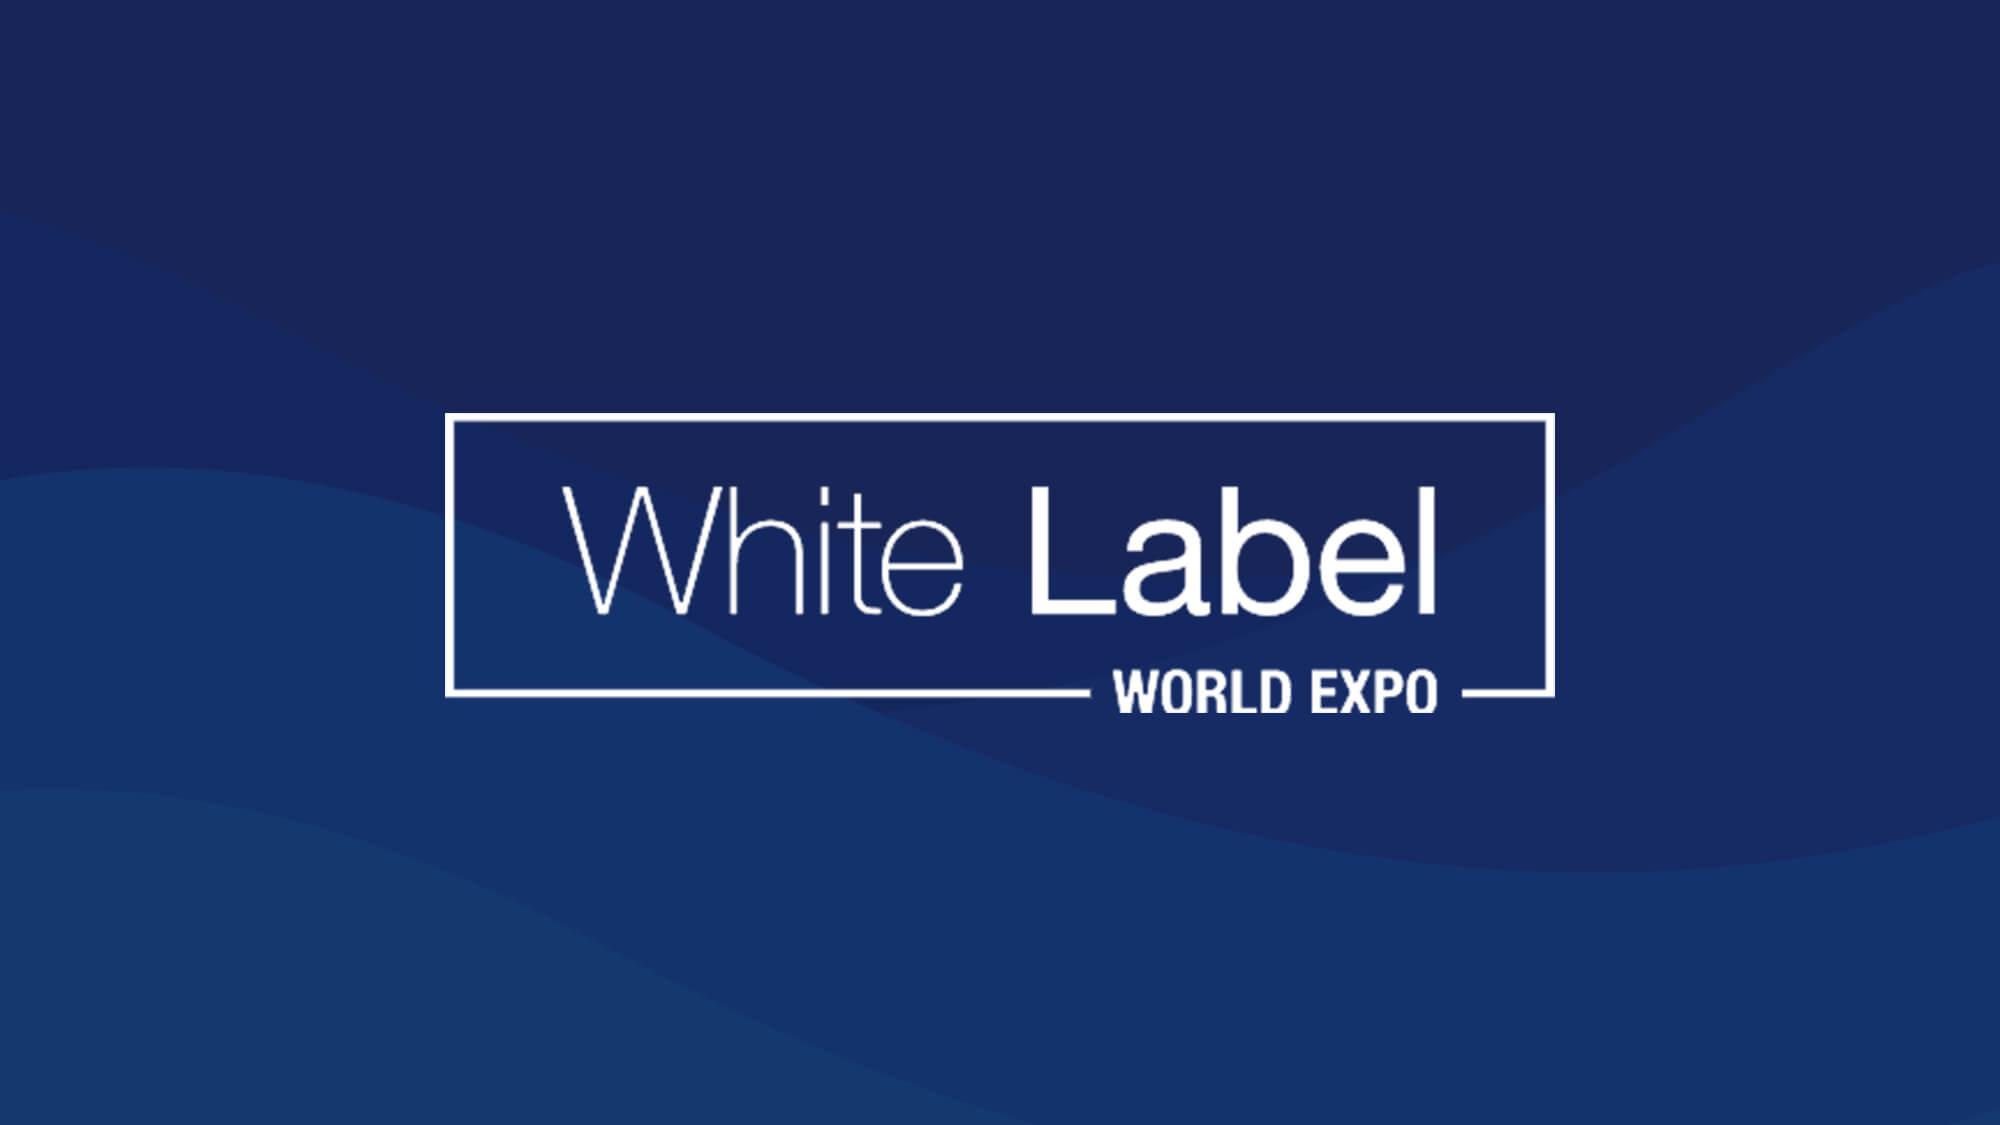 Kunal Chopra & Mitchell Bailey to Speak at White Label World Expo